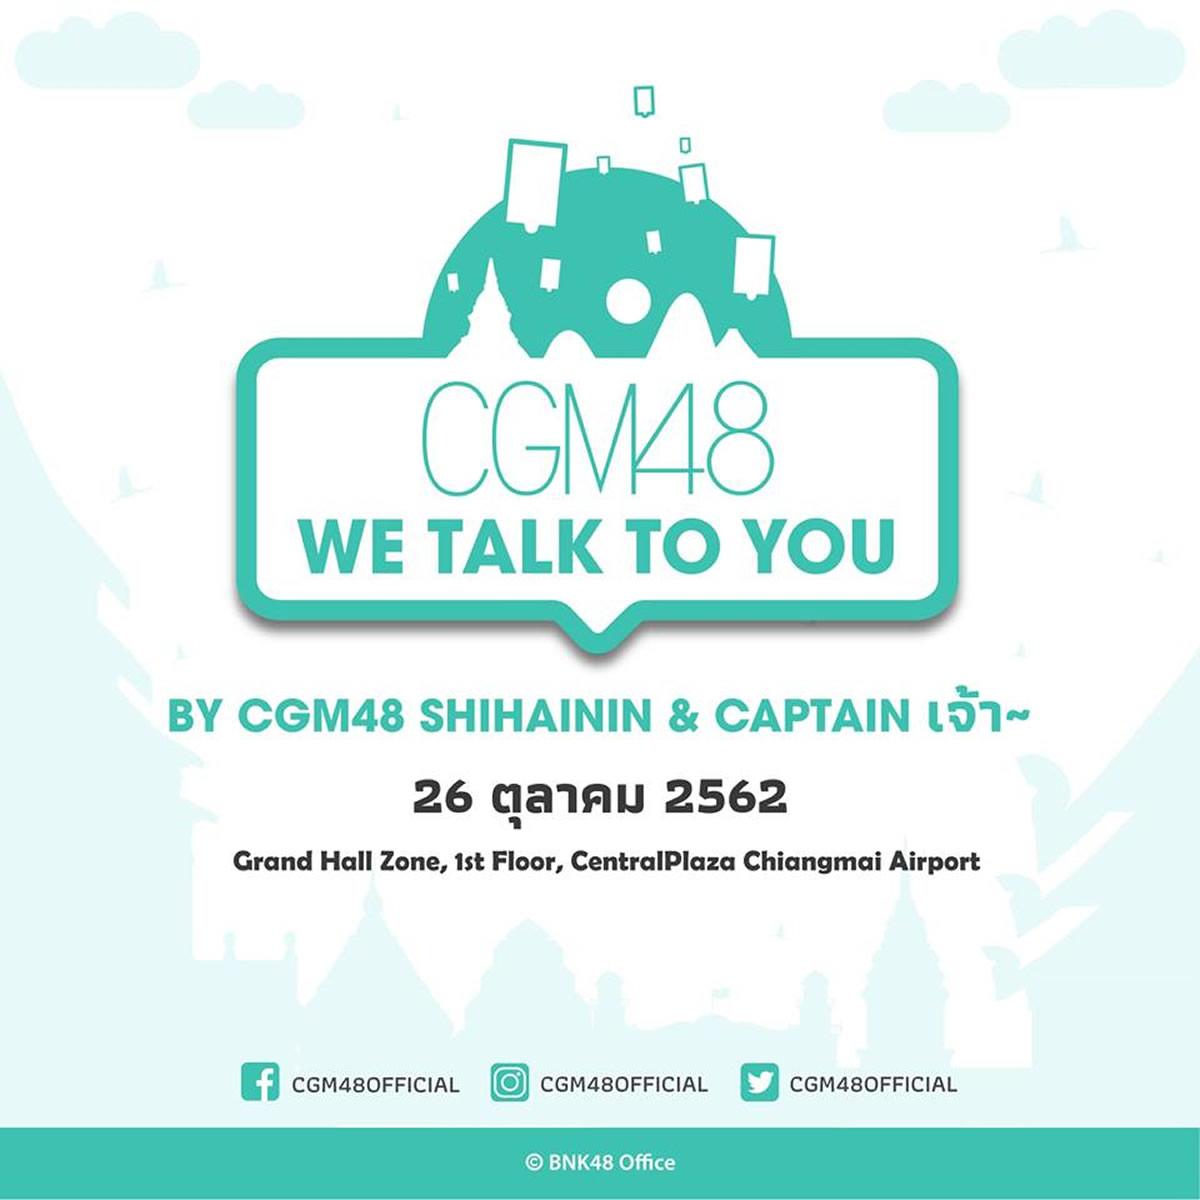 CGM48支配人&キャプテン、2019年10月26日にチェンマイでイベント開催